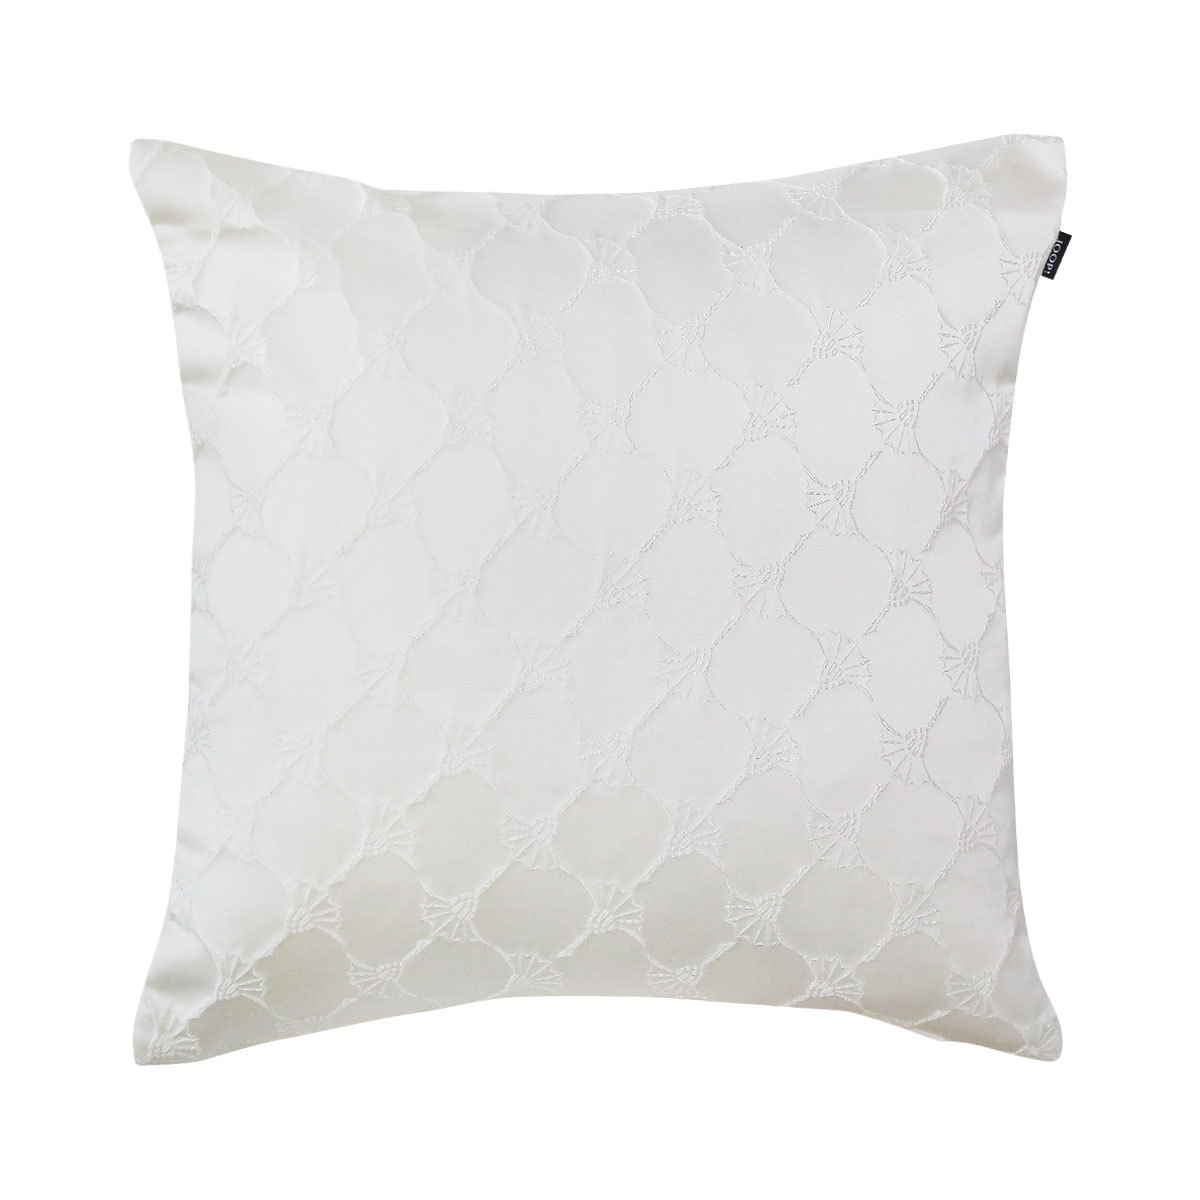 joop kissenh lle fina weiss g nstig online kaufen bei bettwaren shop. Black Bedroom Furniture Sets. Home Design Ideas